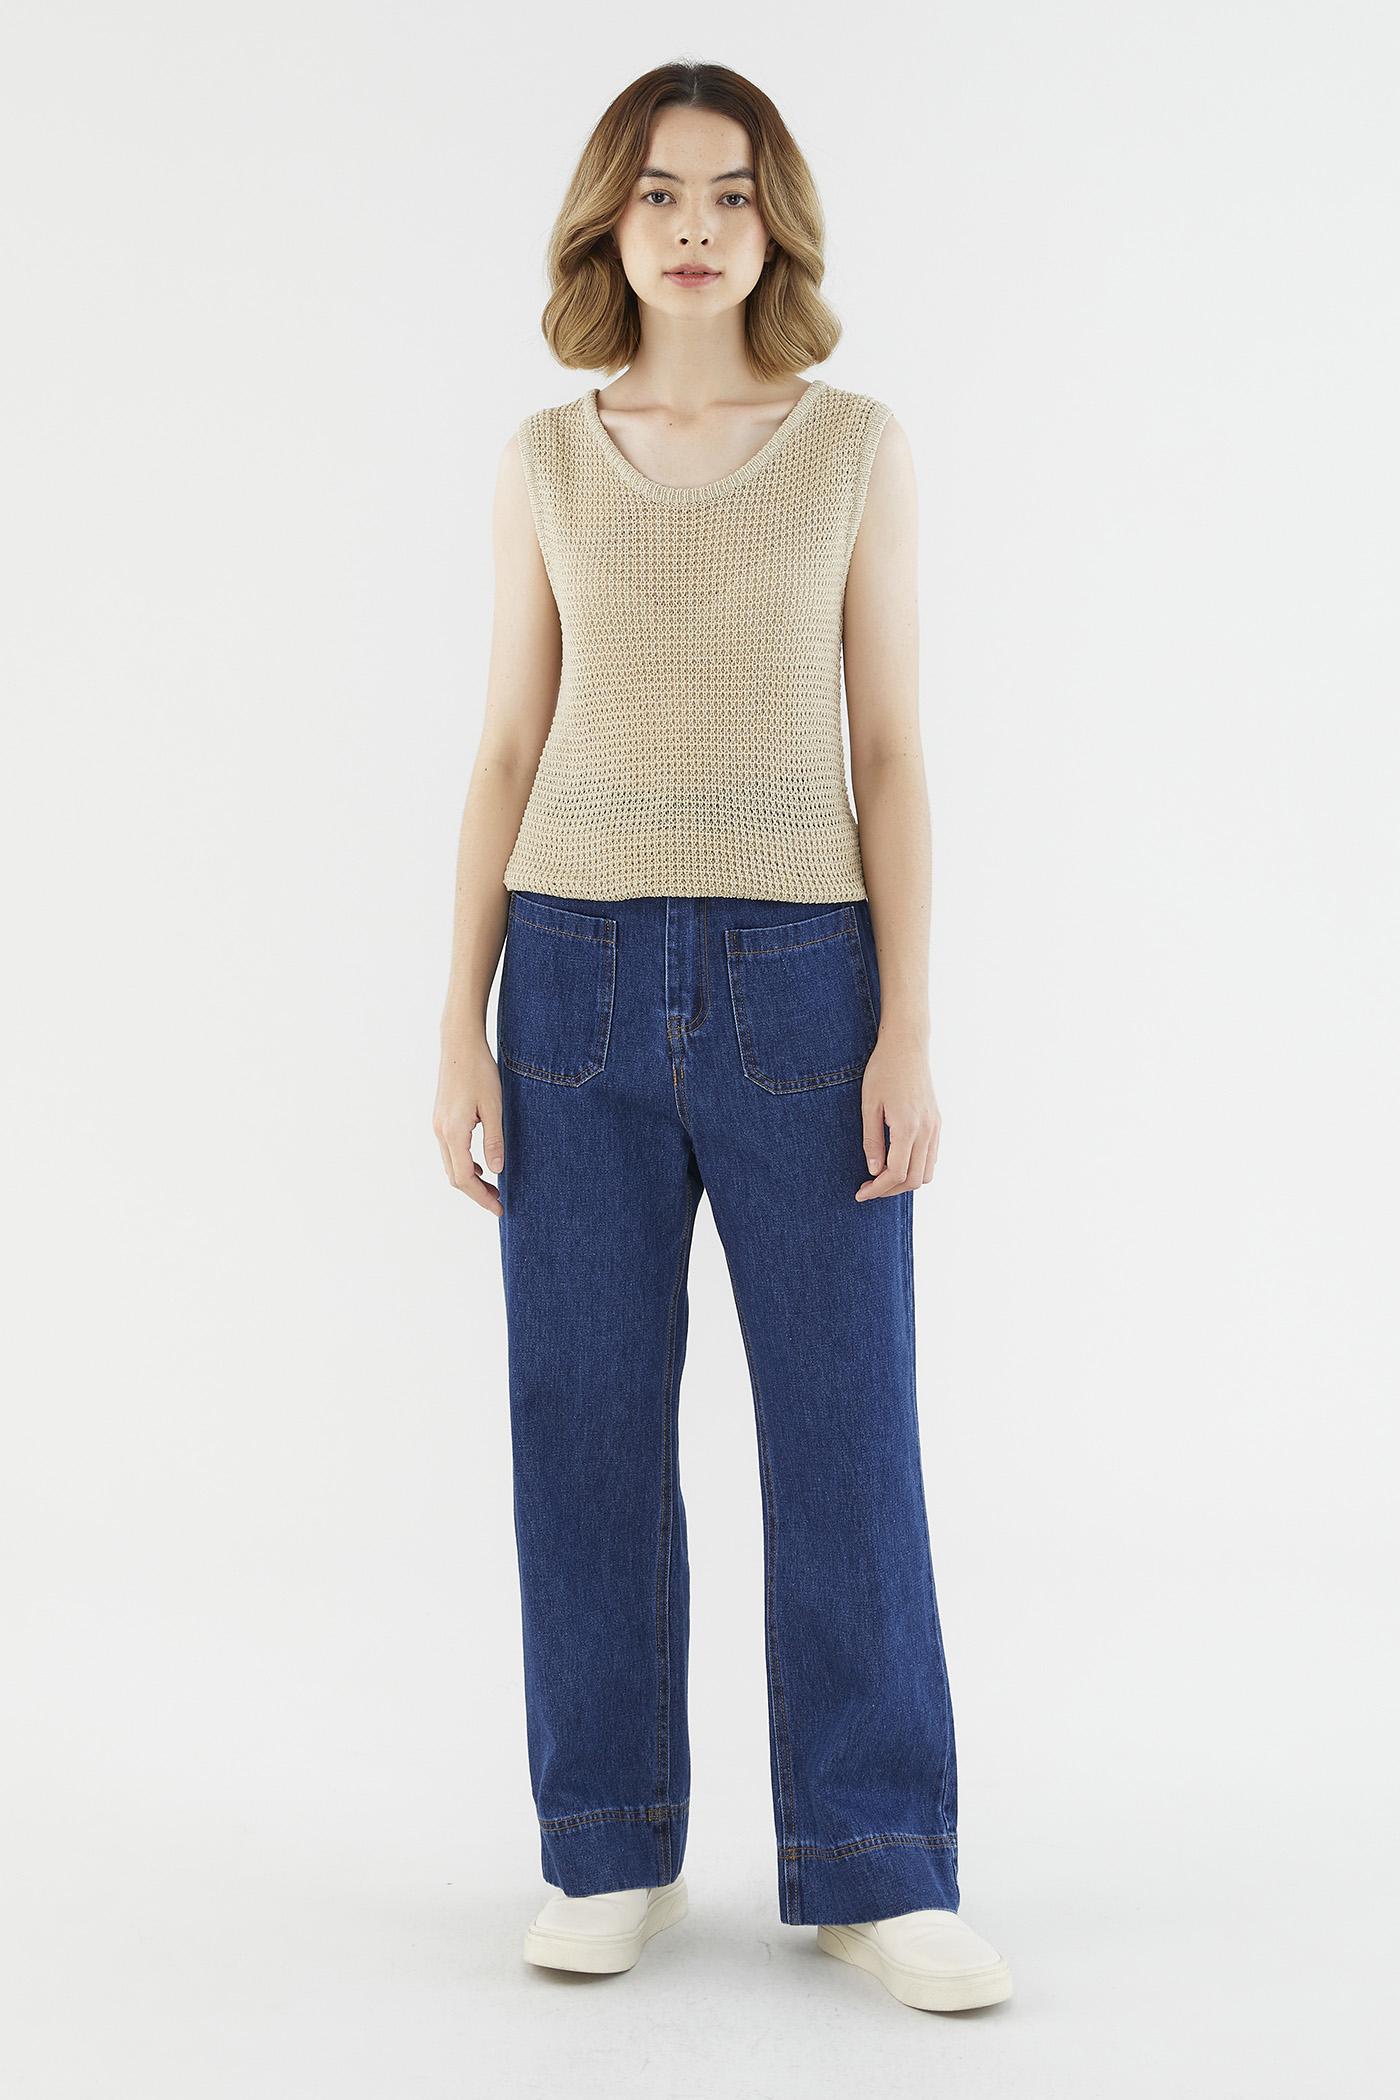 Clarica Knit Tank